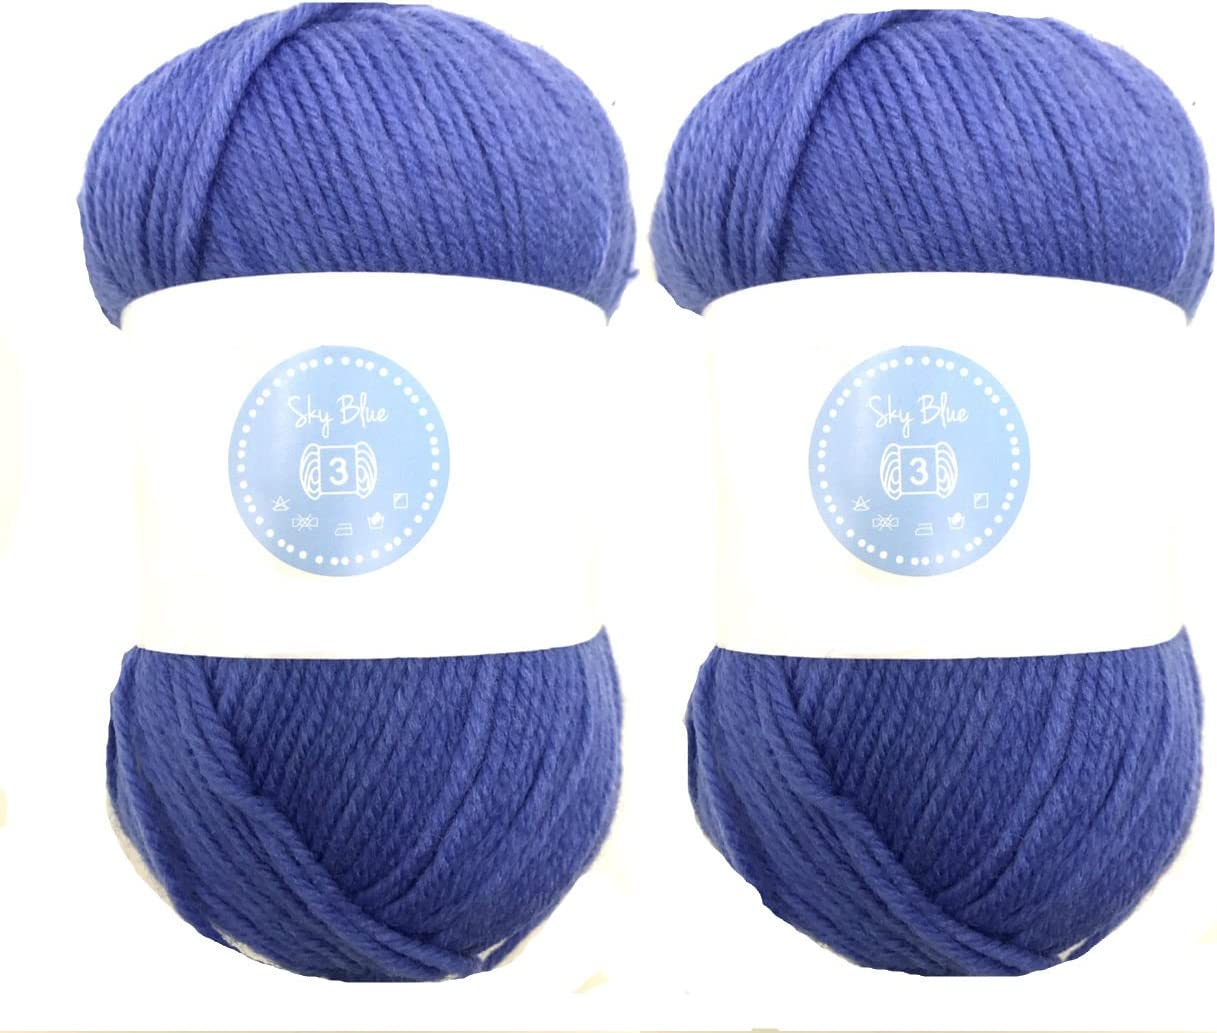 DARK GREY Needles Acrylic Knitting Yarn 8 Ply 100g Ball